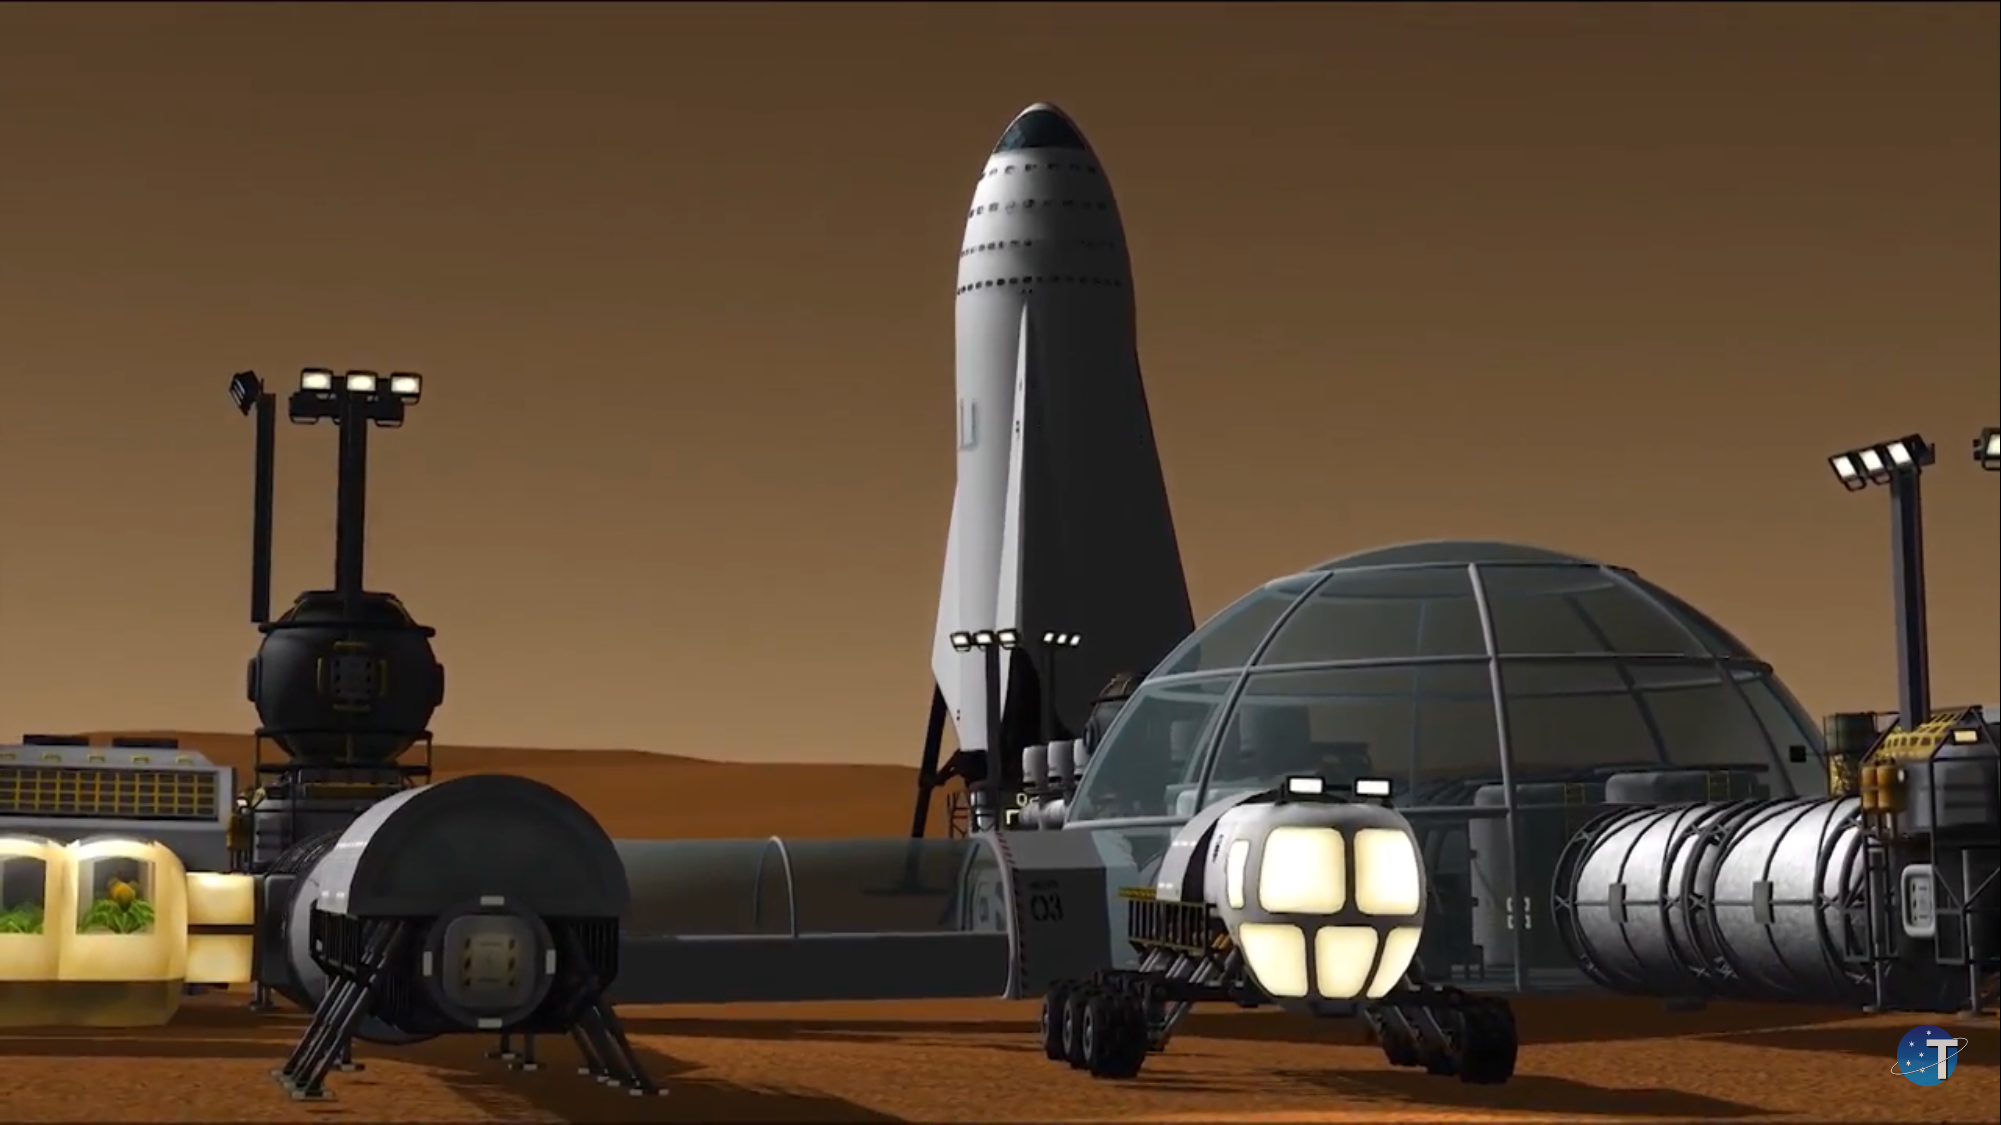 spacex mars base - photo #5